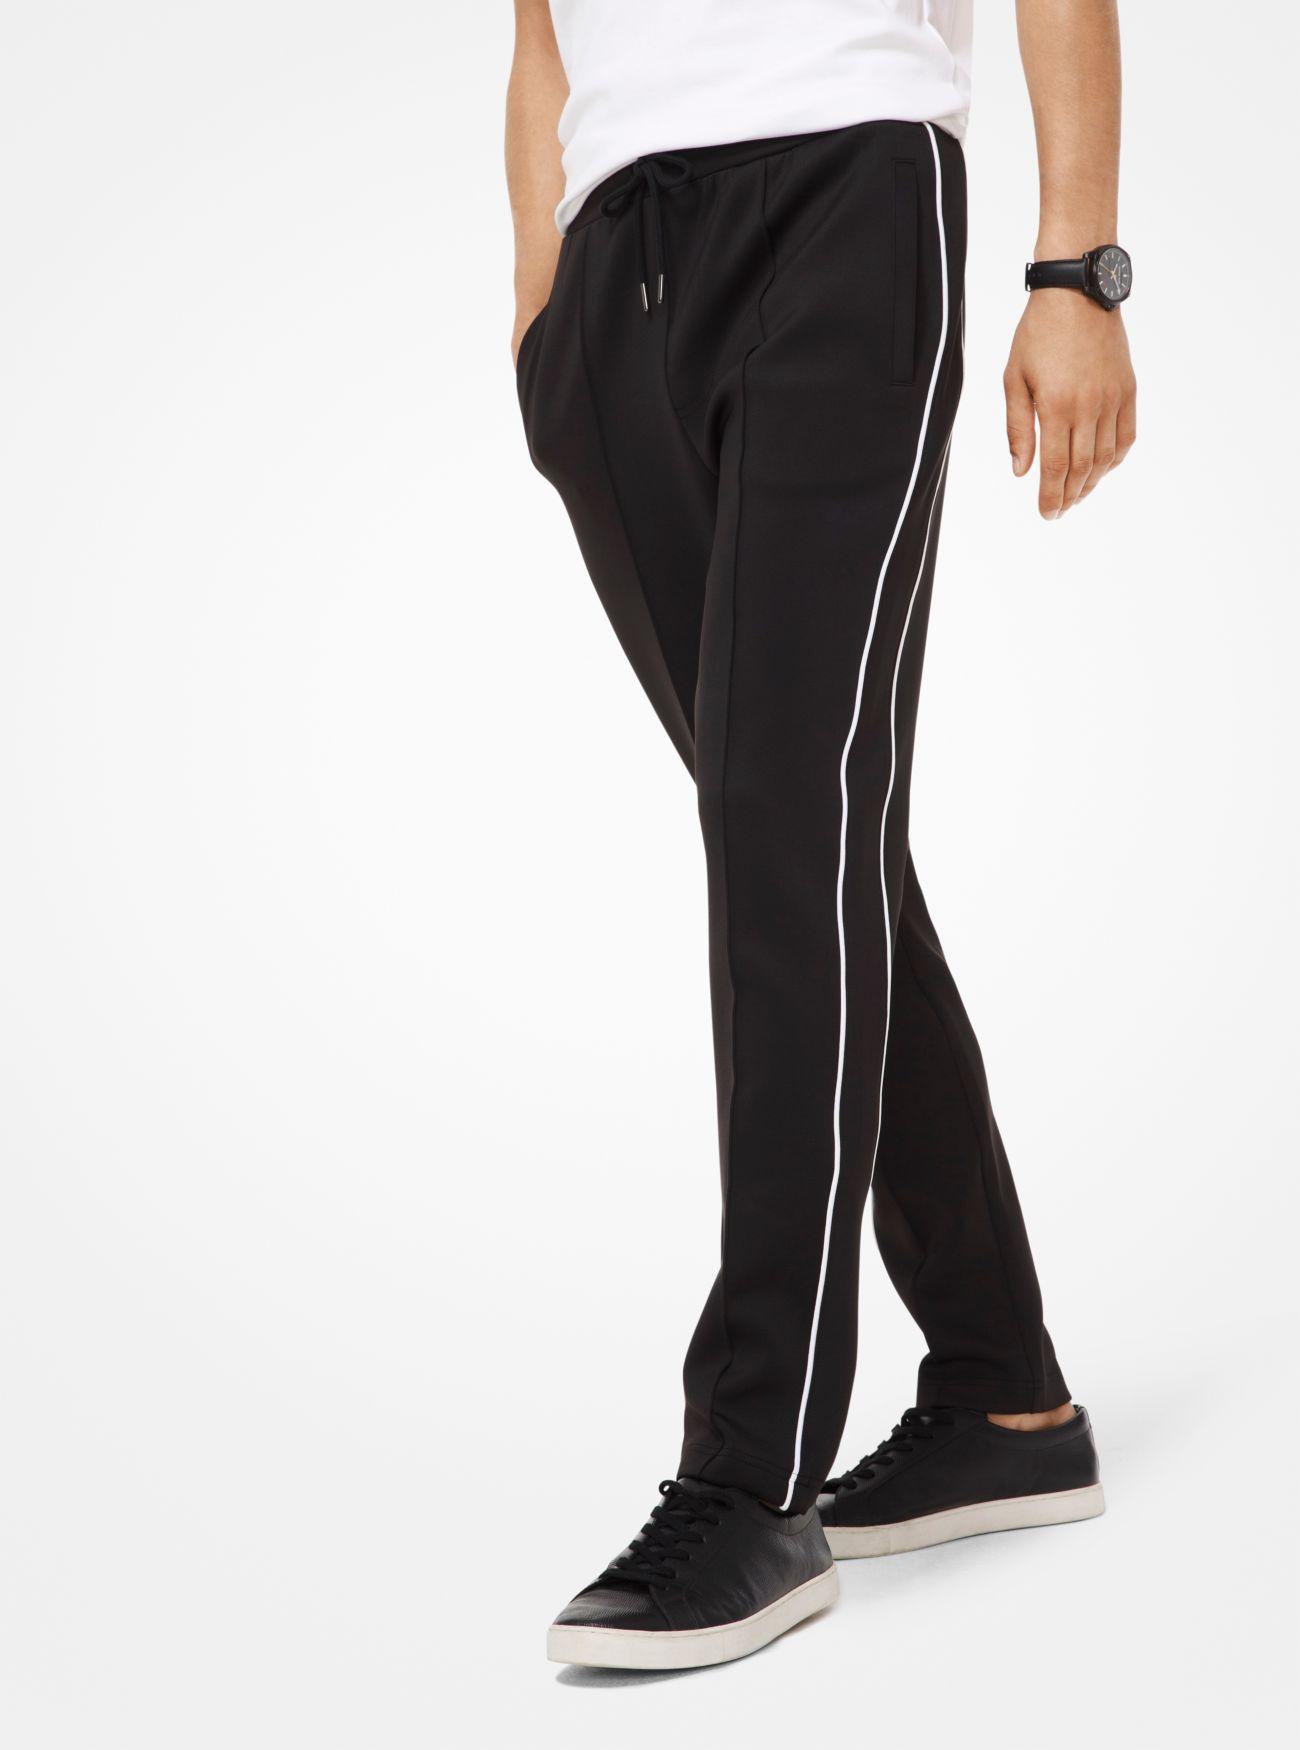 Pantalón deportivo de neopreno ... cd48520c8f1d